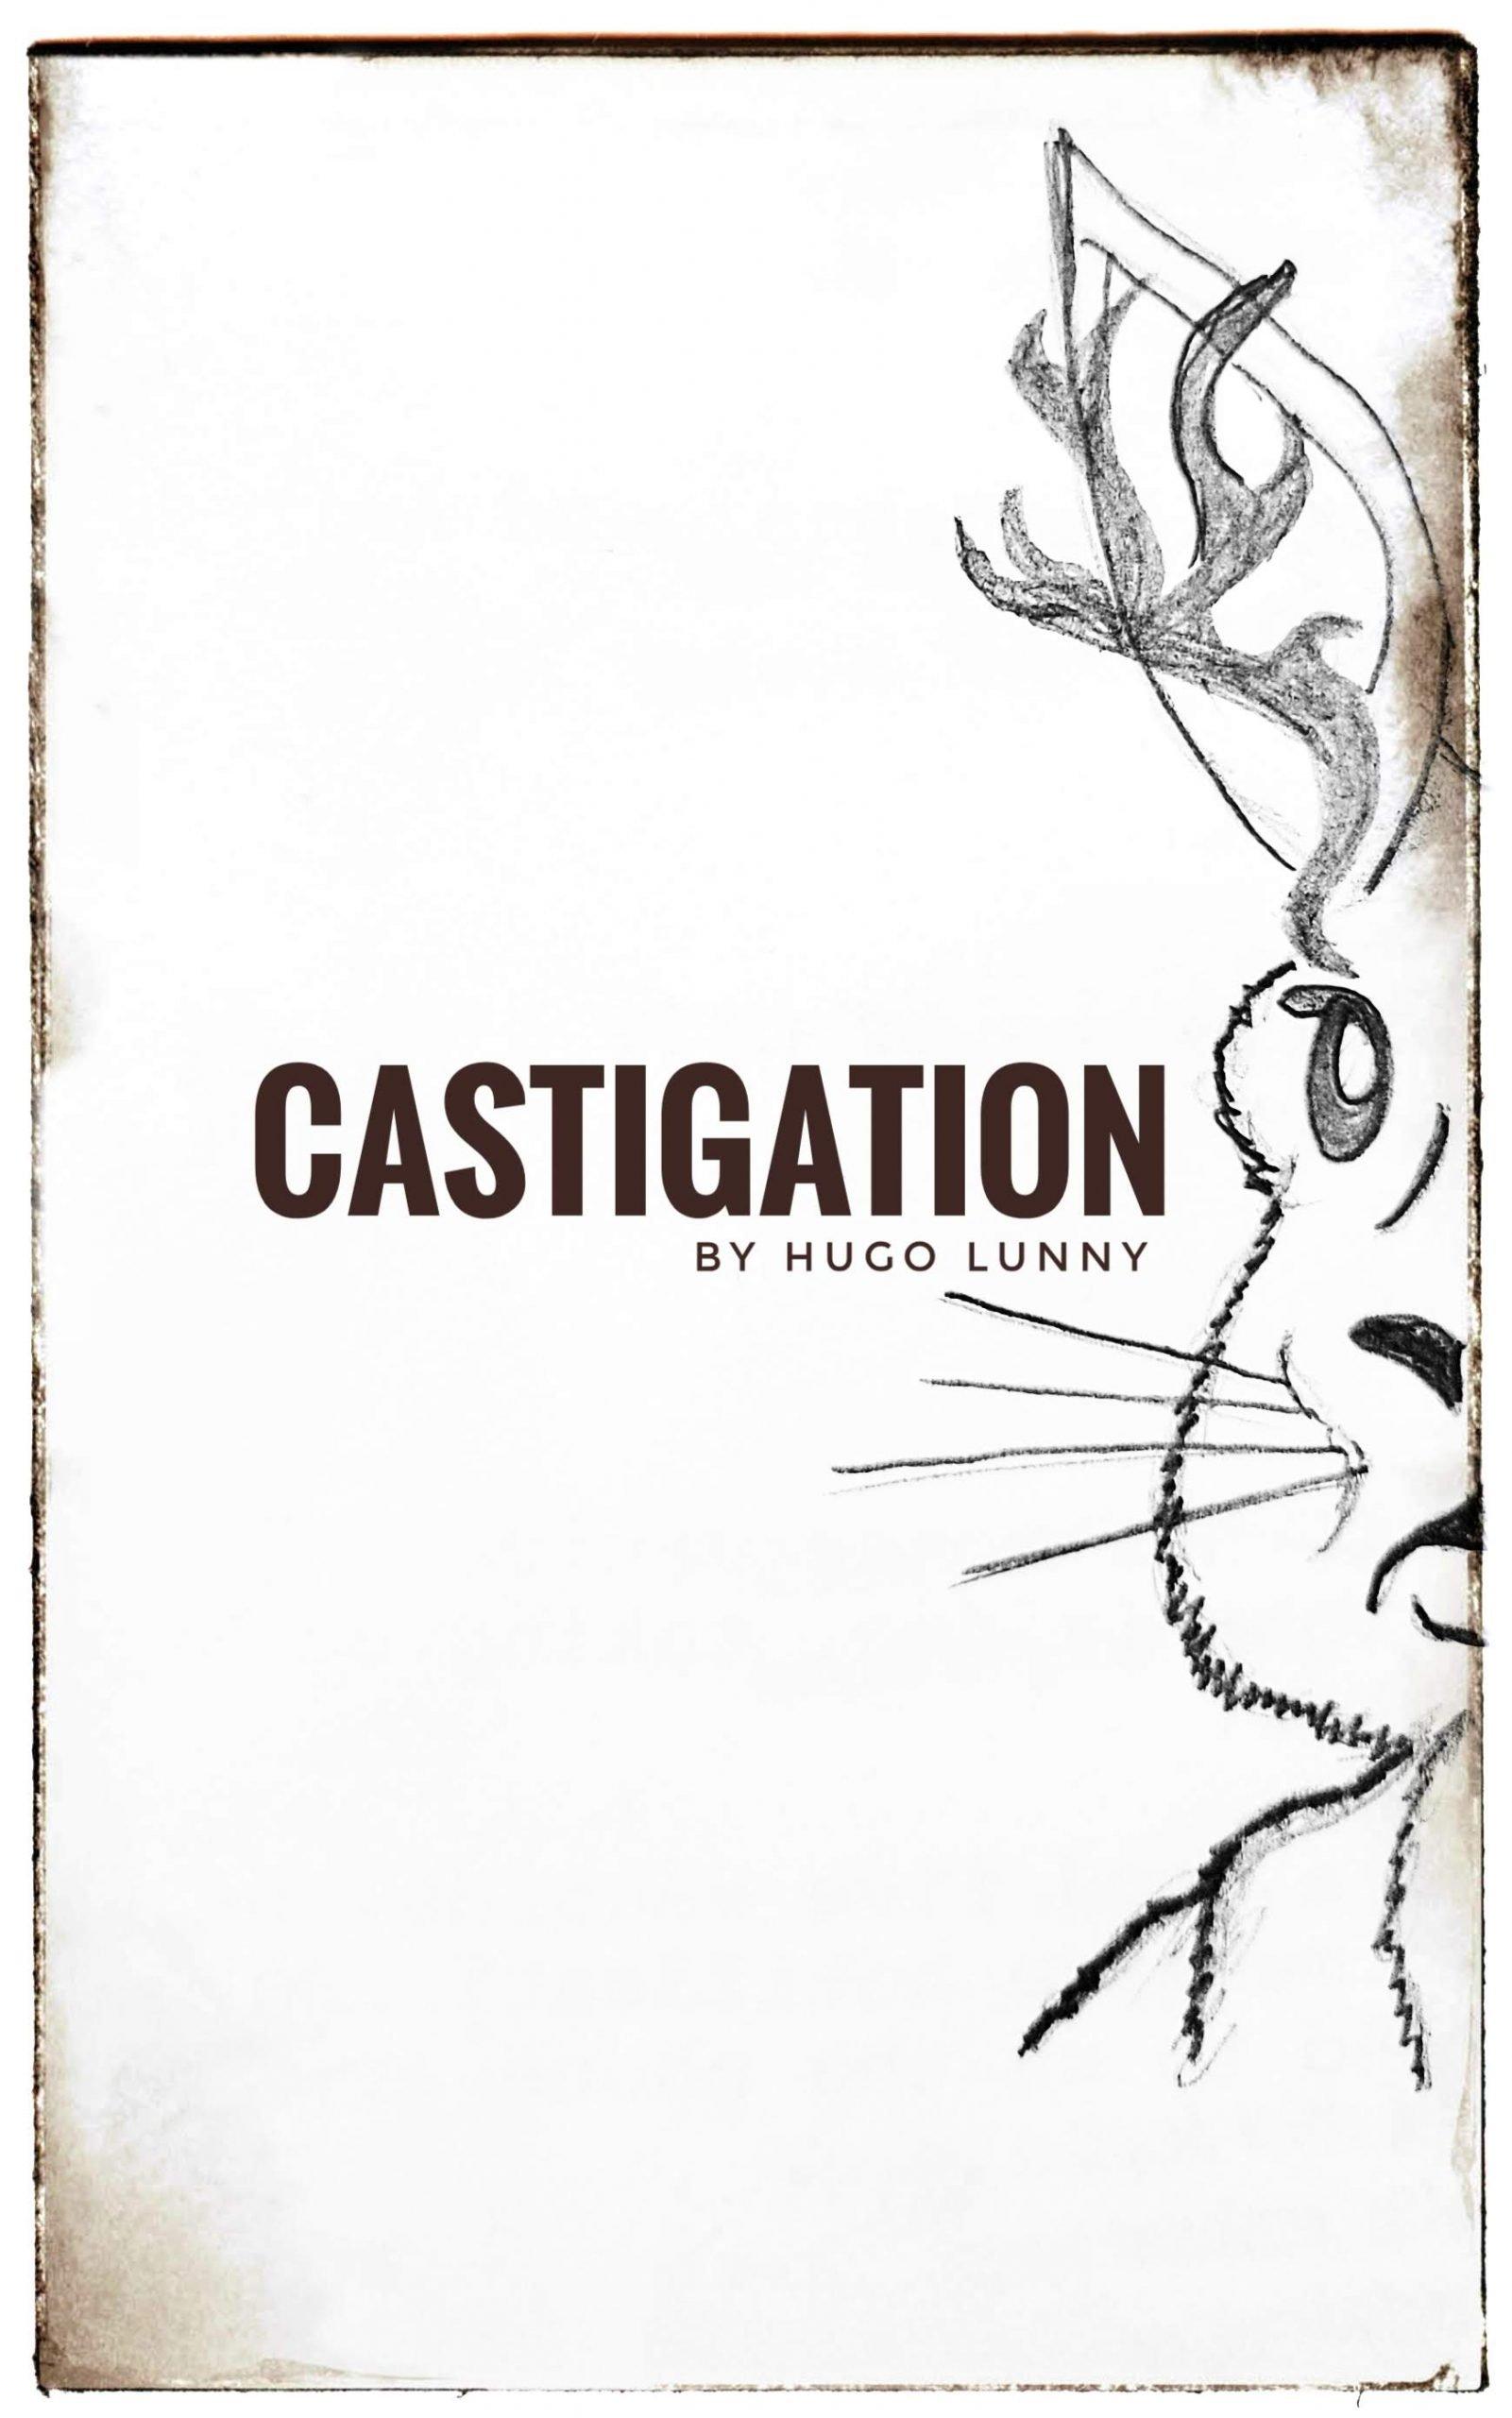 The Castigation movie